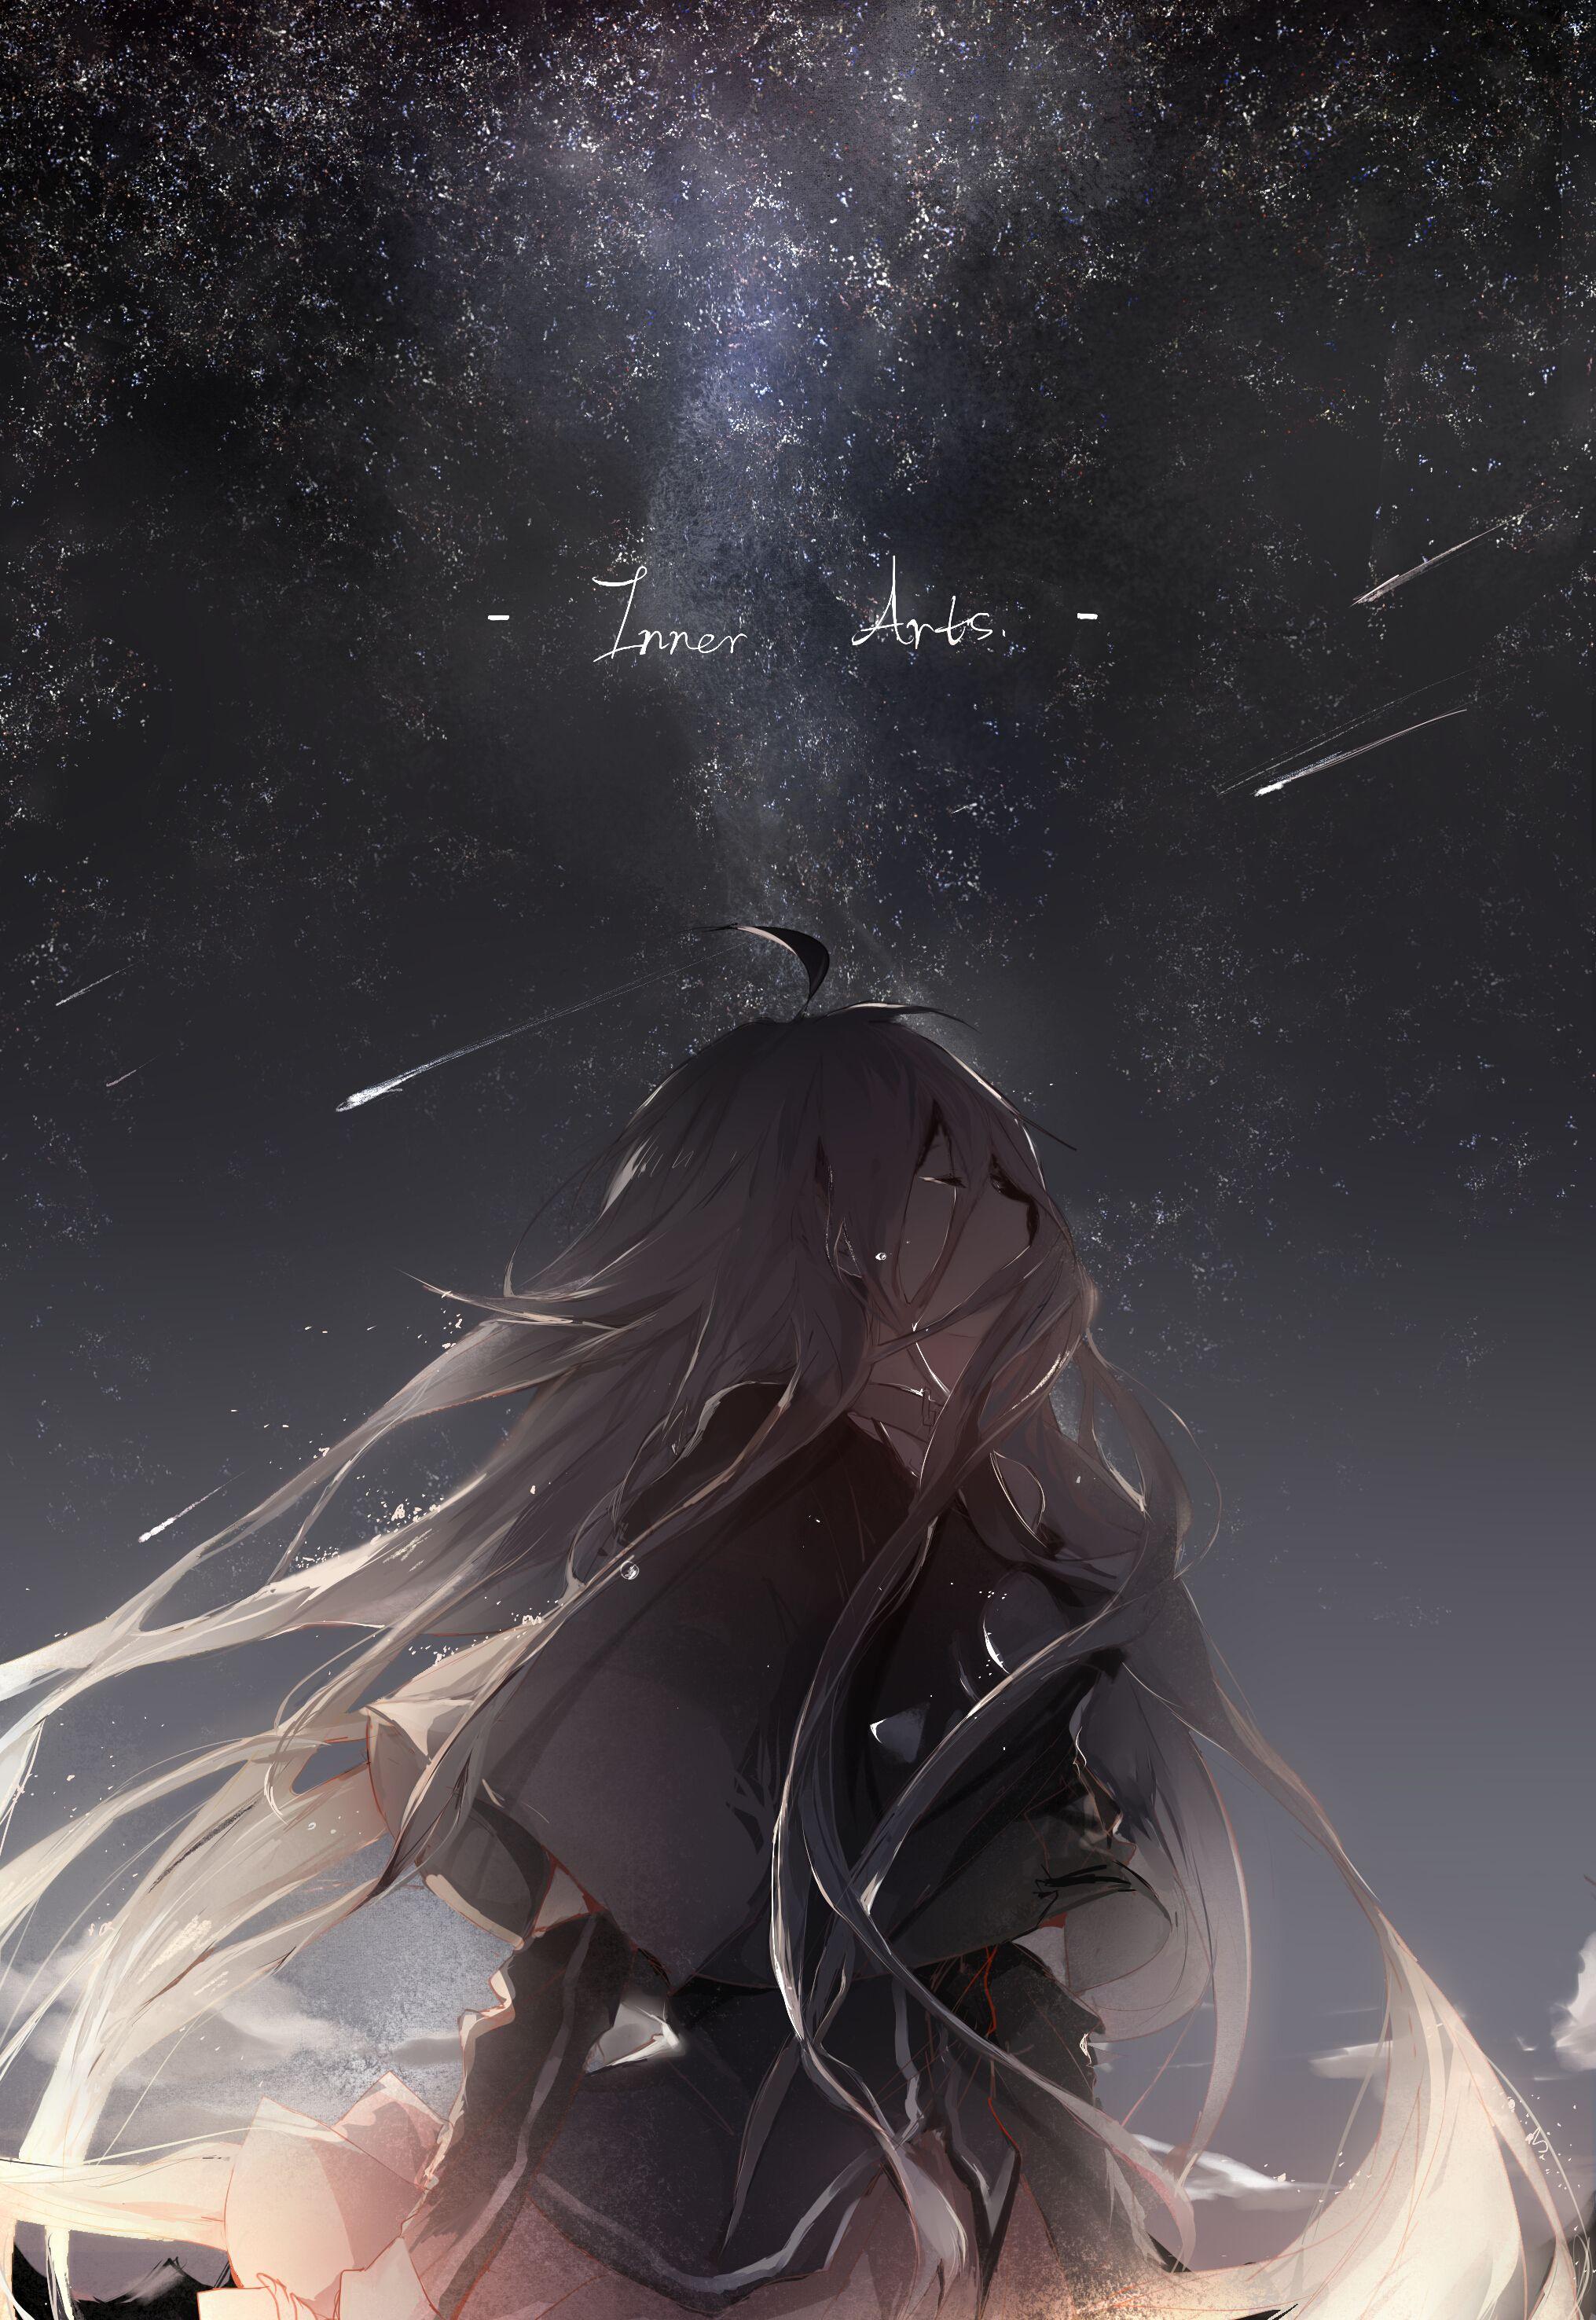 Anime, Anime artwork